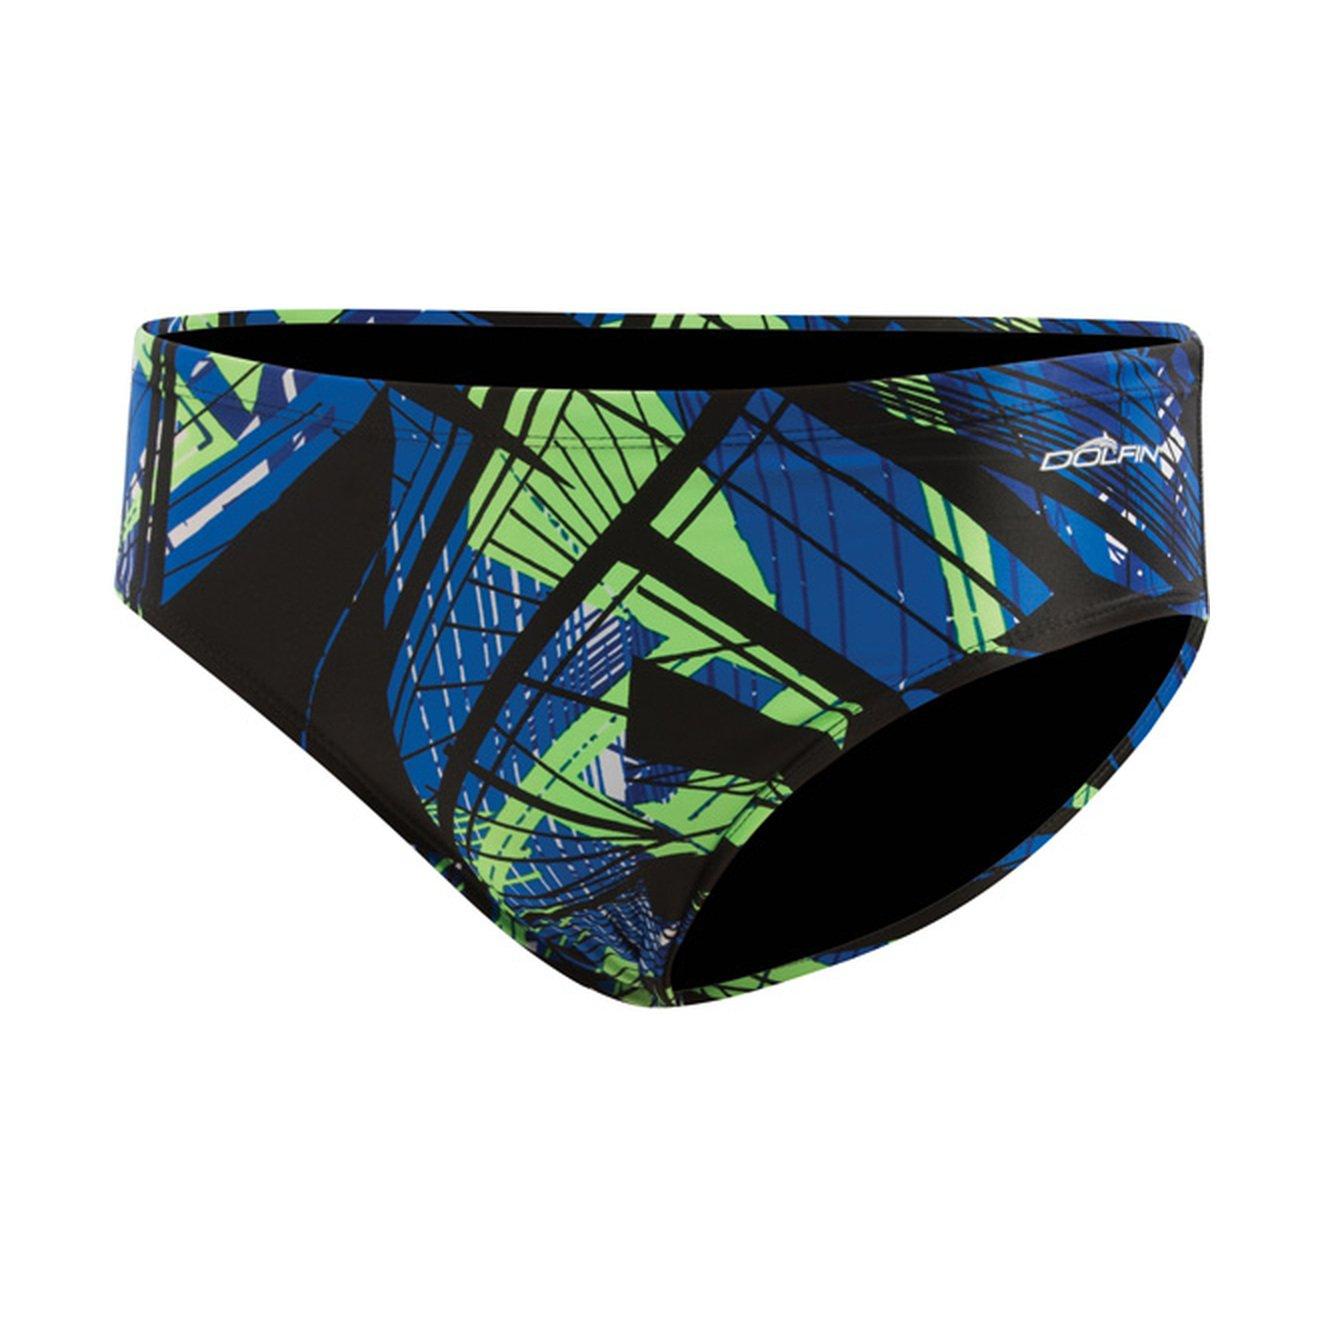 dfc220961f Amazon.com: Dolfin Torrent XtraSleek Eco Racer Male: Clothing